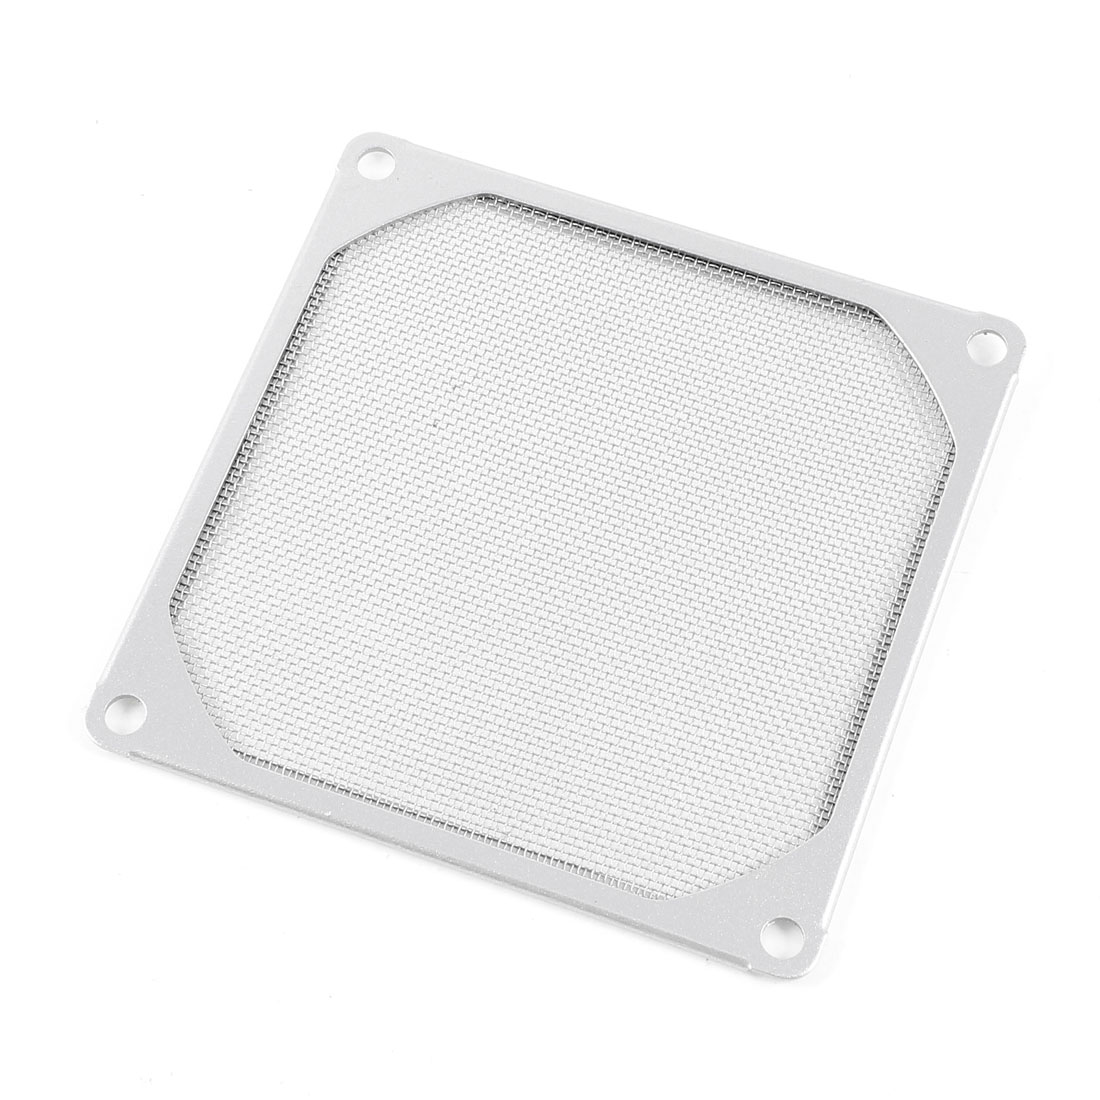 Computer PC Fan Filter Aluminum Mesh Dust Guard Silver Tone 120mm x 120mm